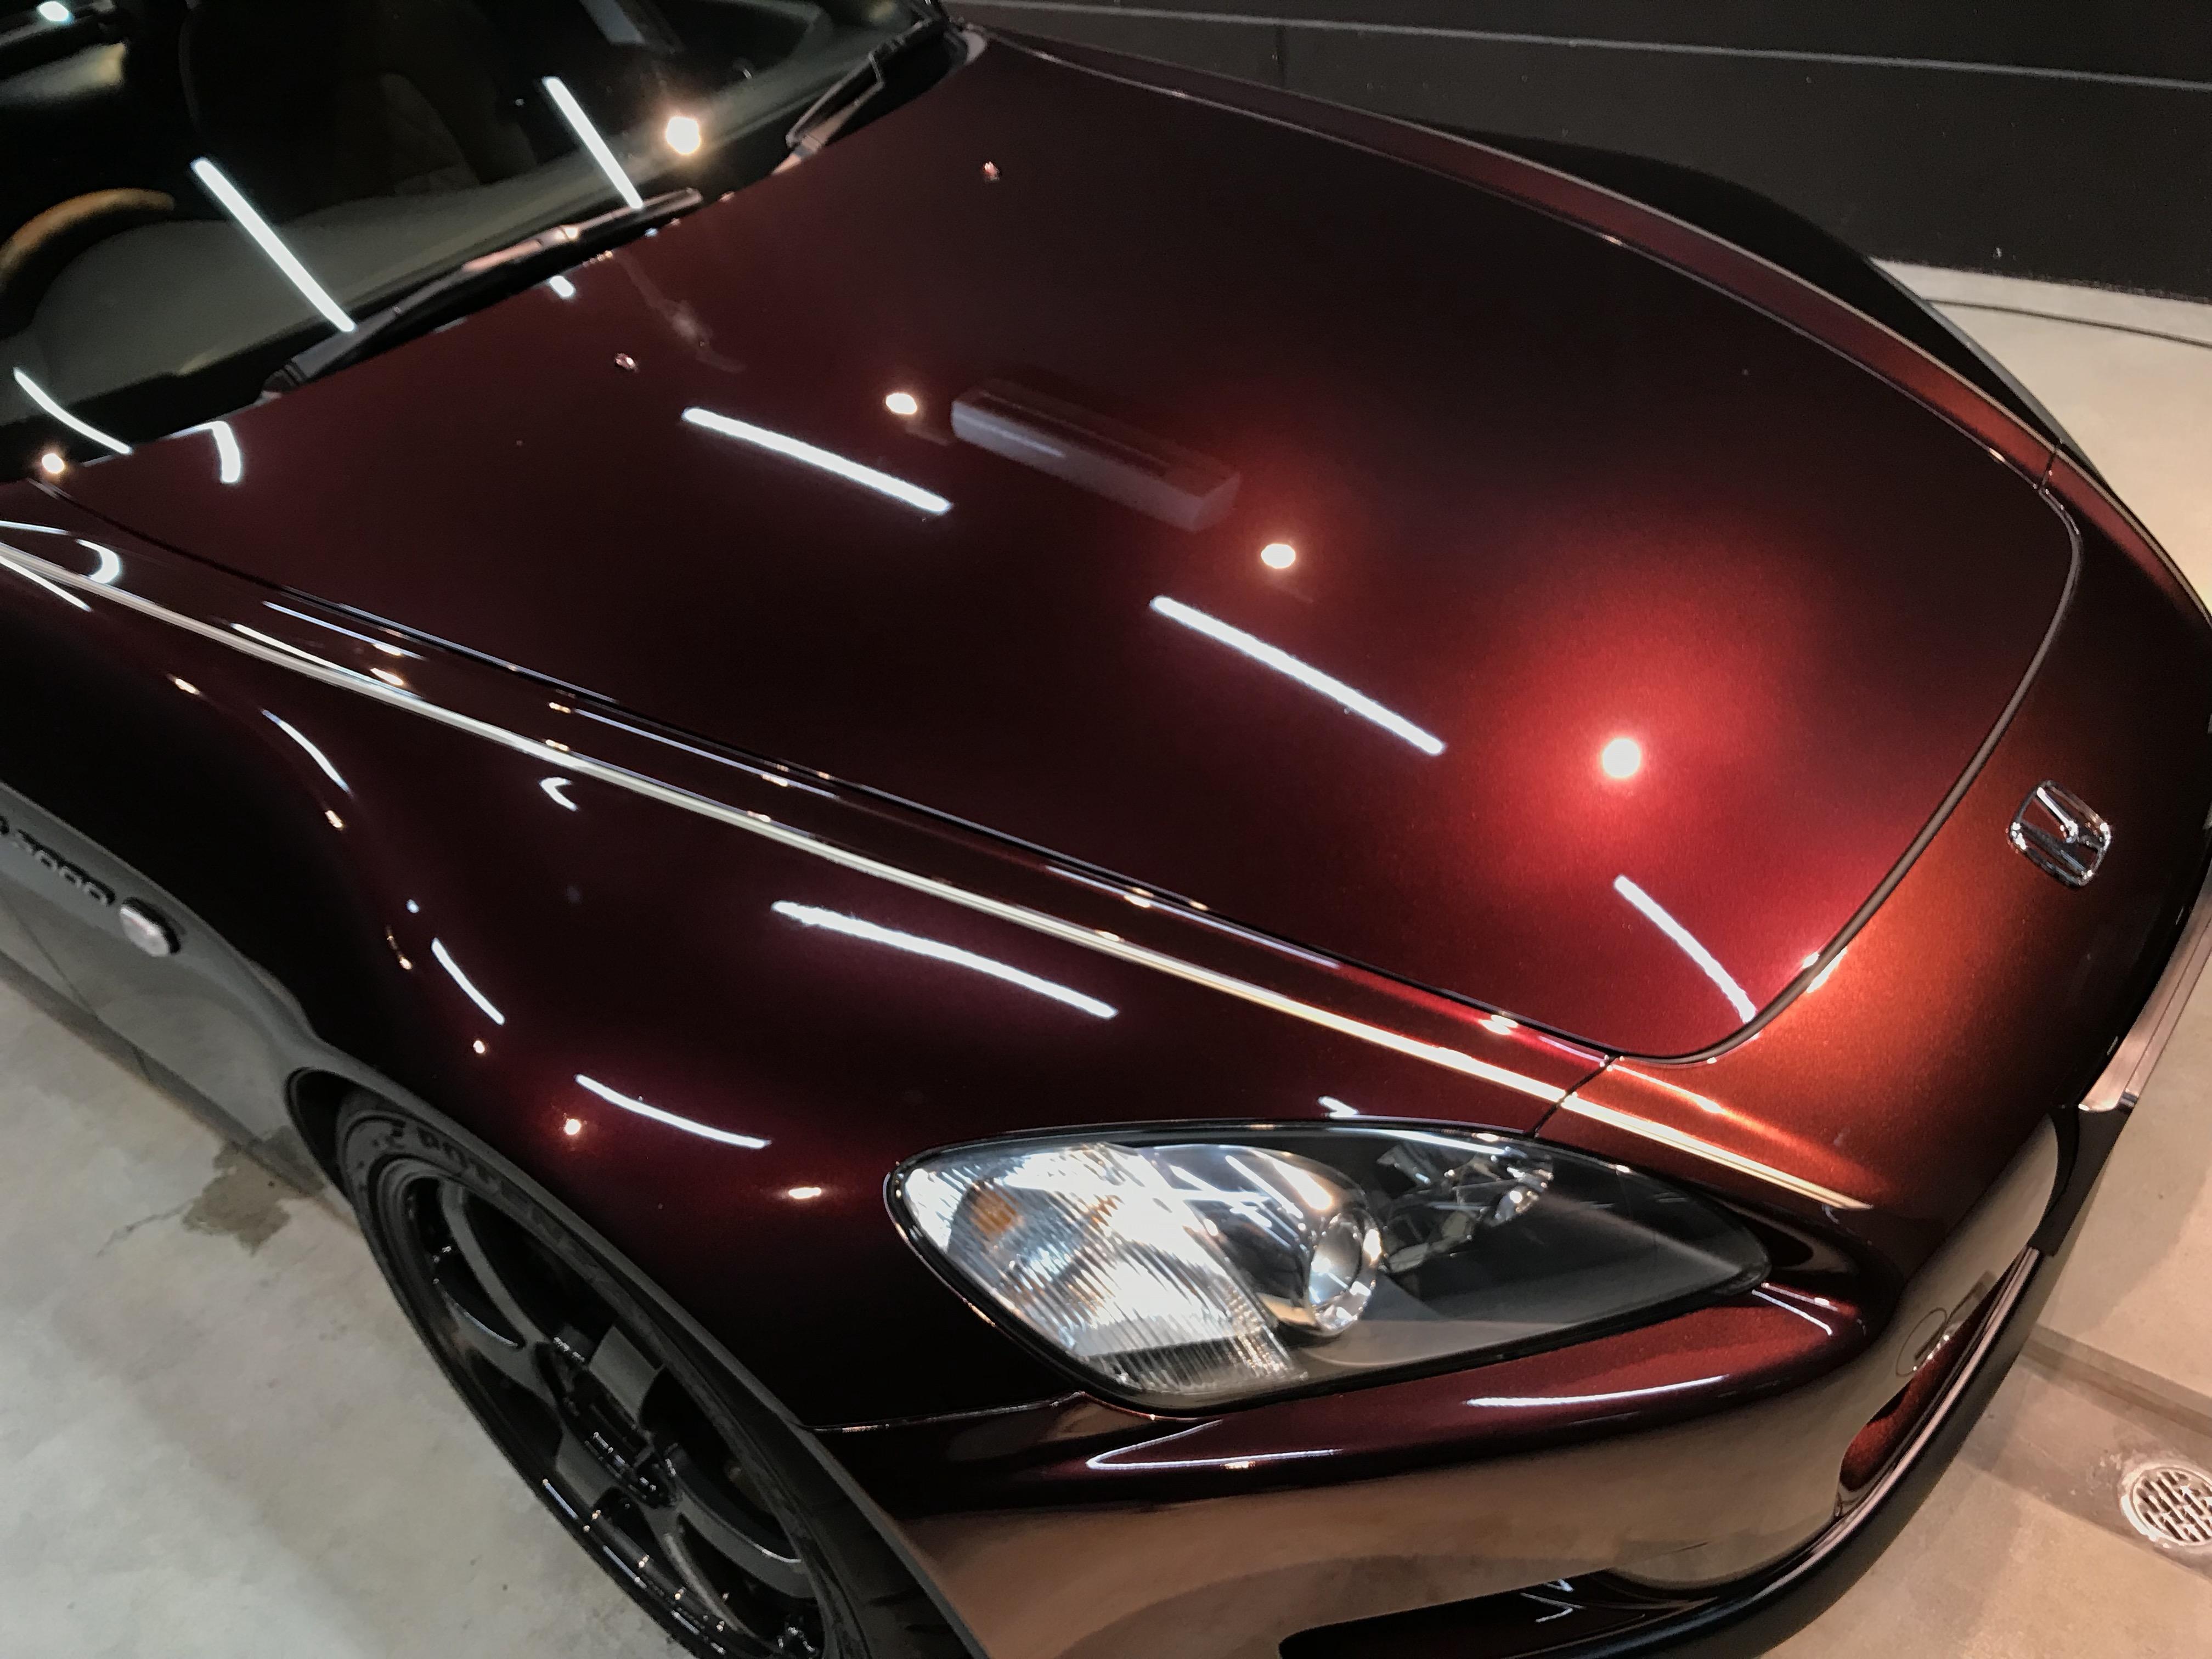 S2000ジオーレ ボディコーティングと謹賀新年